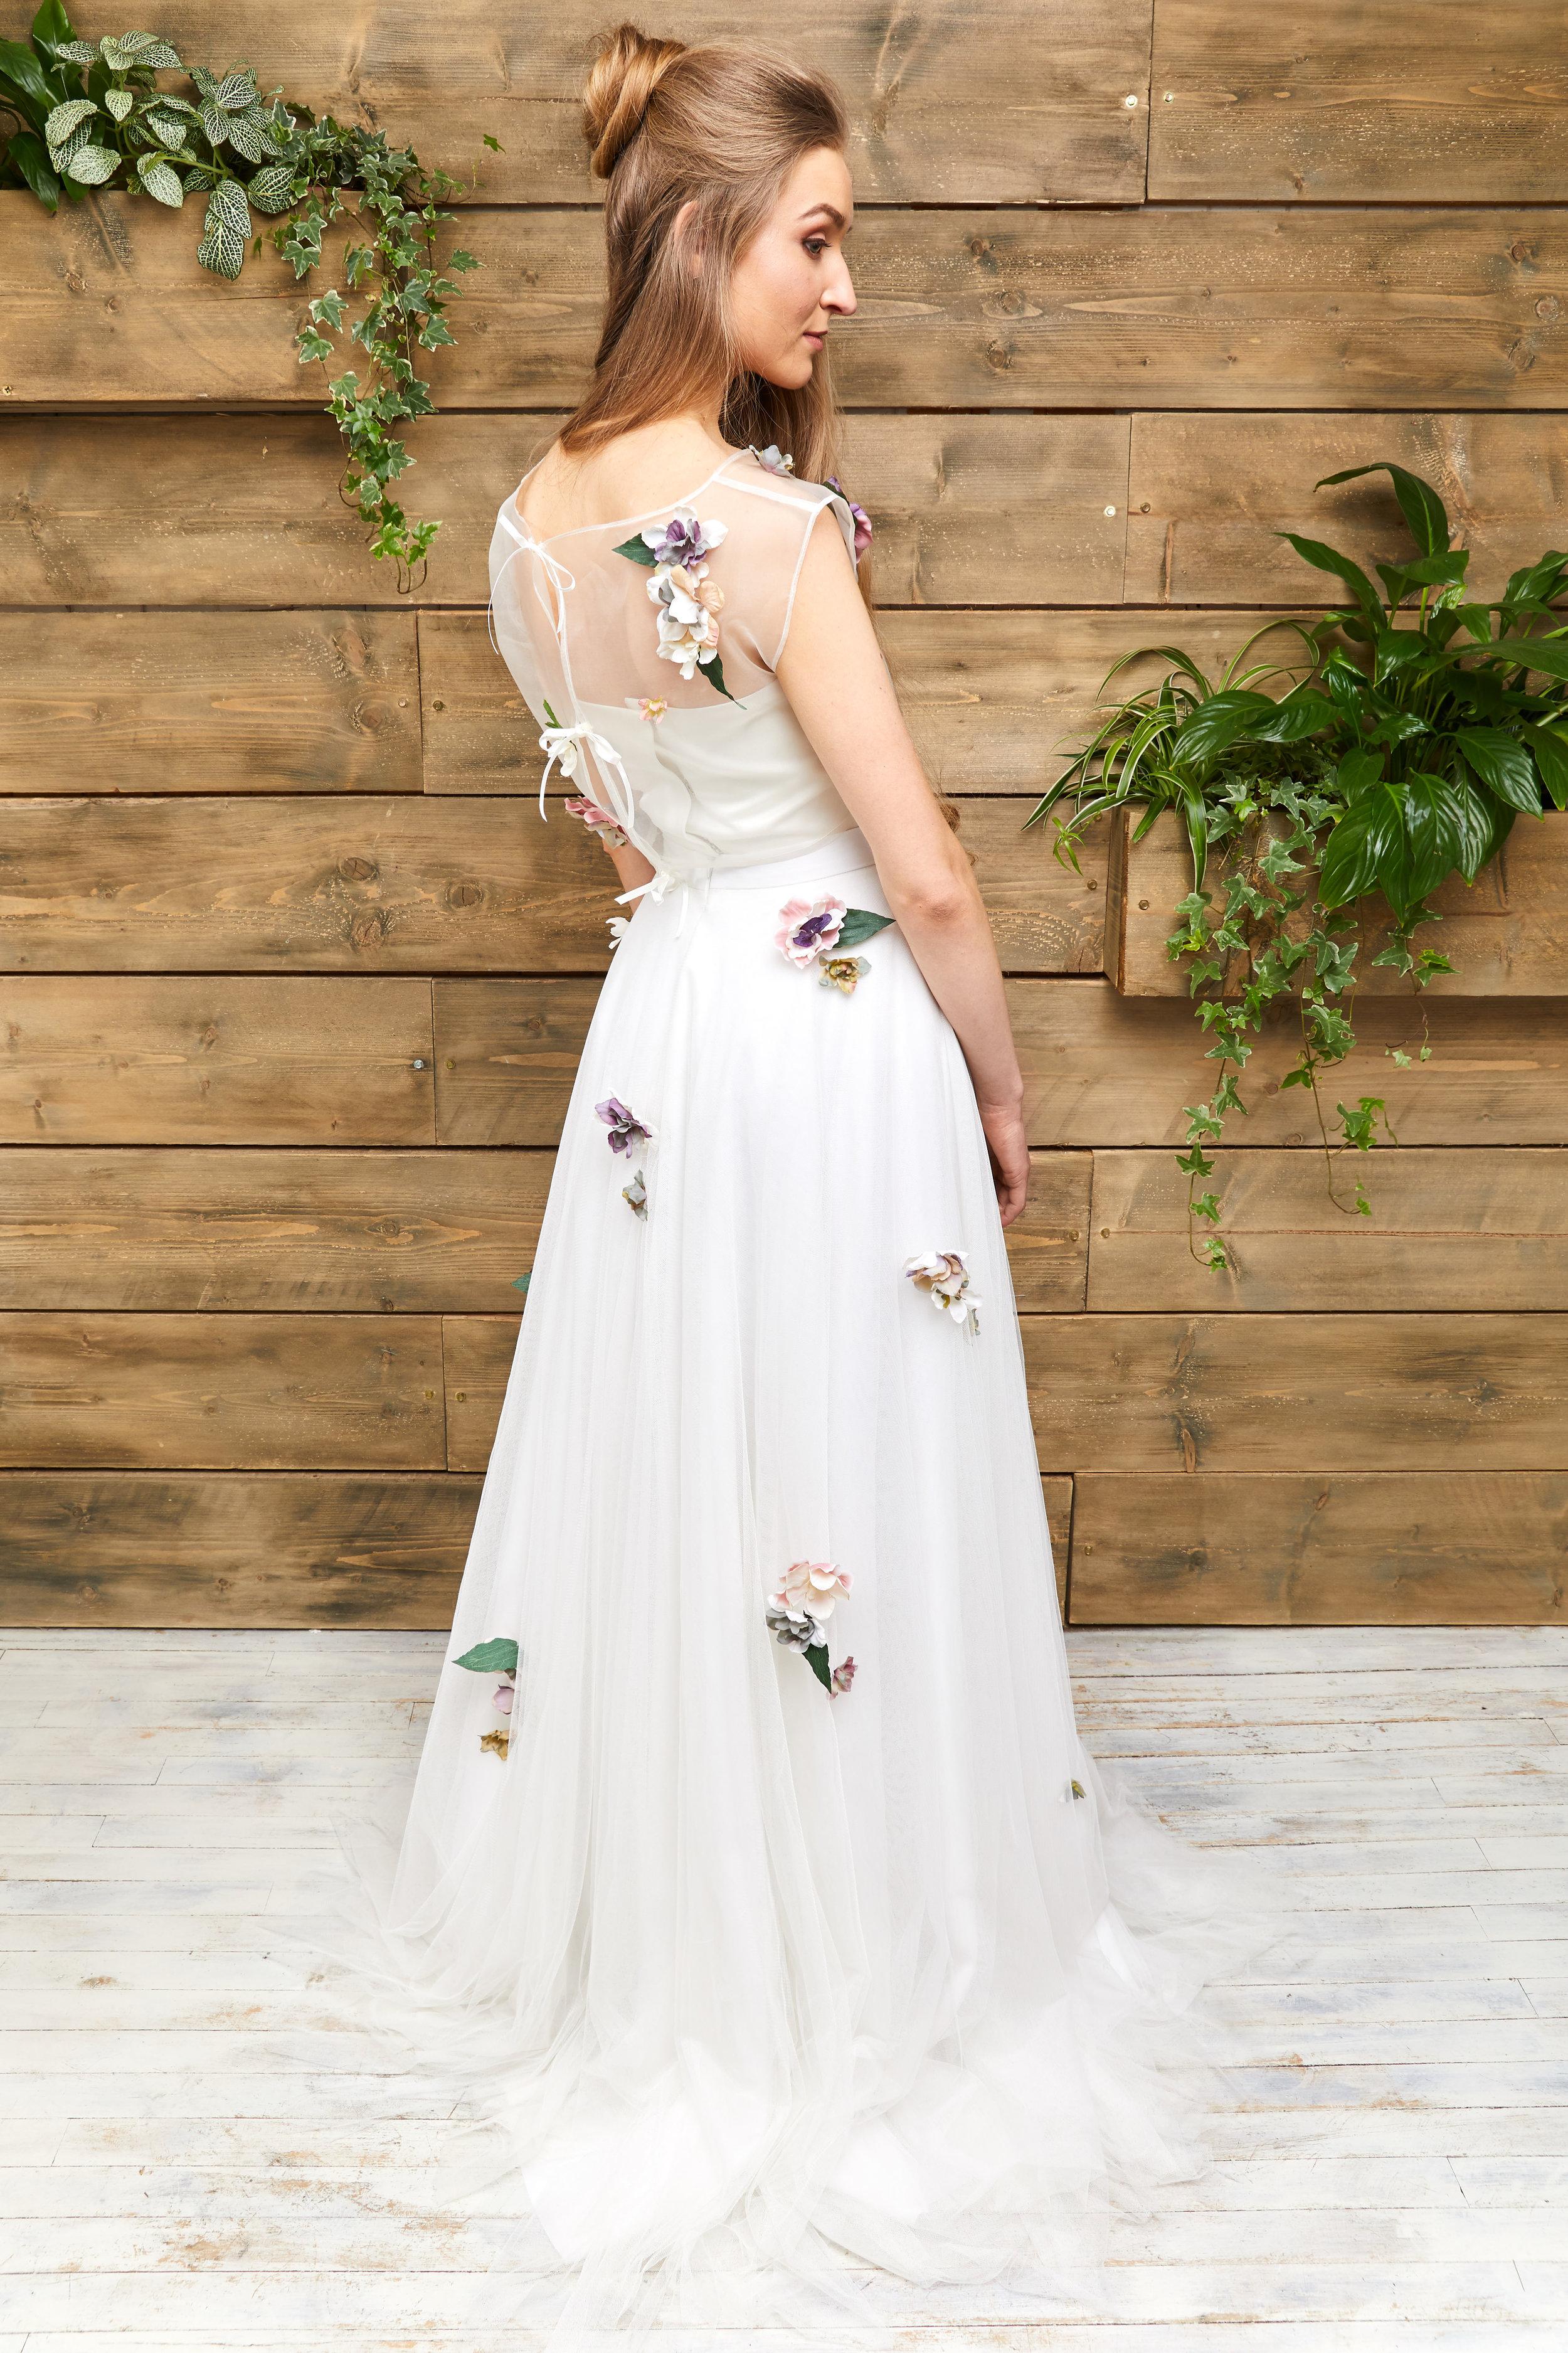 Rachel Burgess Bridal Boutique - Bridal Separates - Handmade Wedding, Boho wedding dress, E&W Couture.jpg